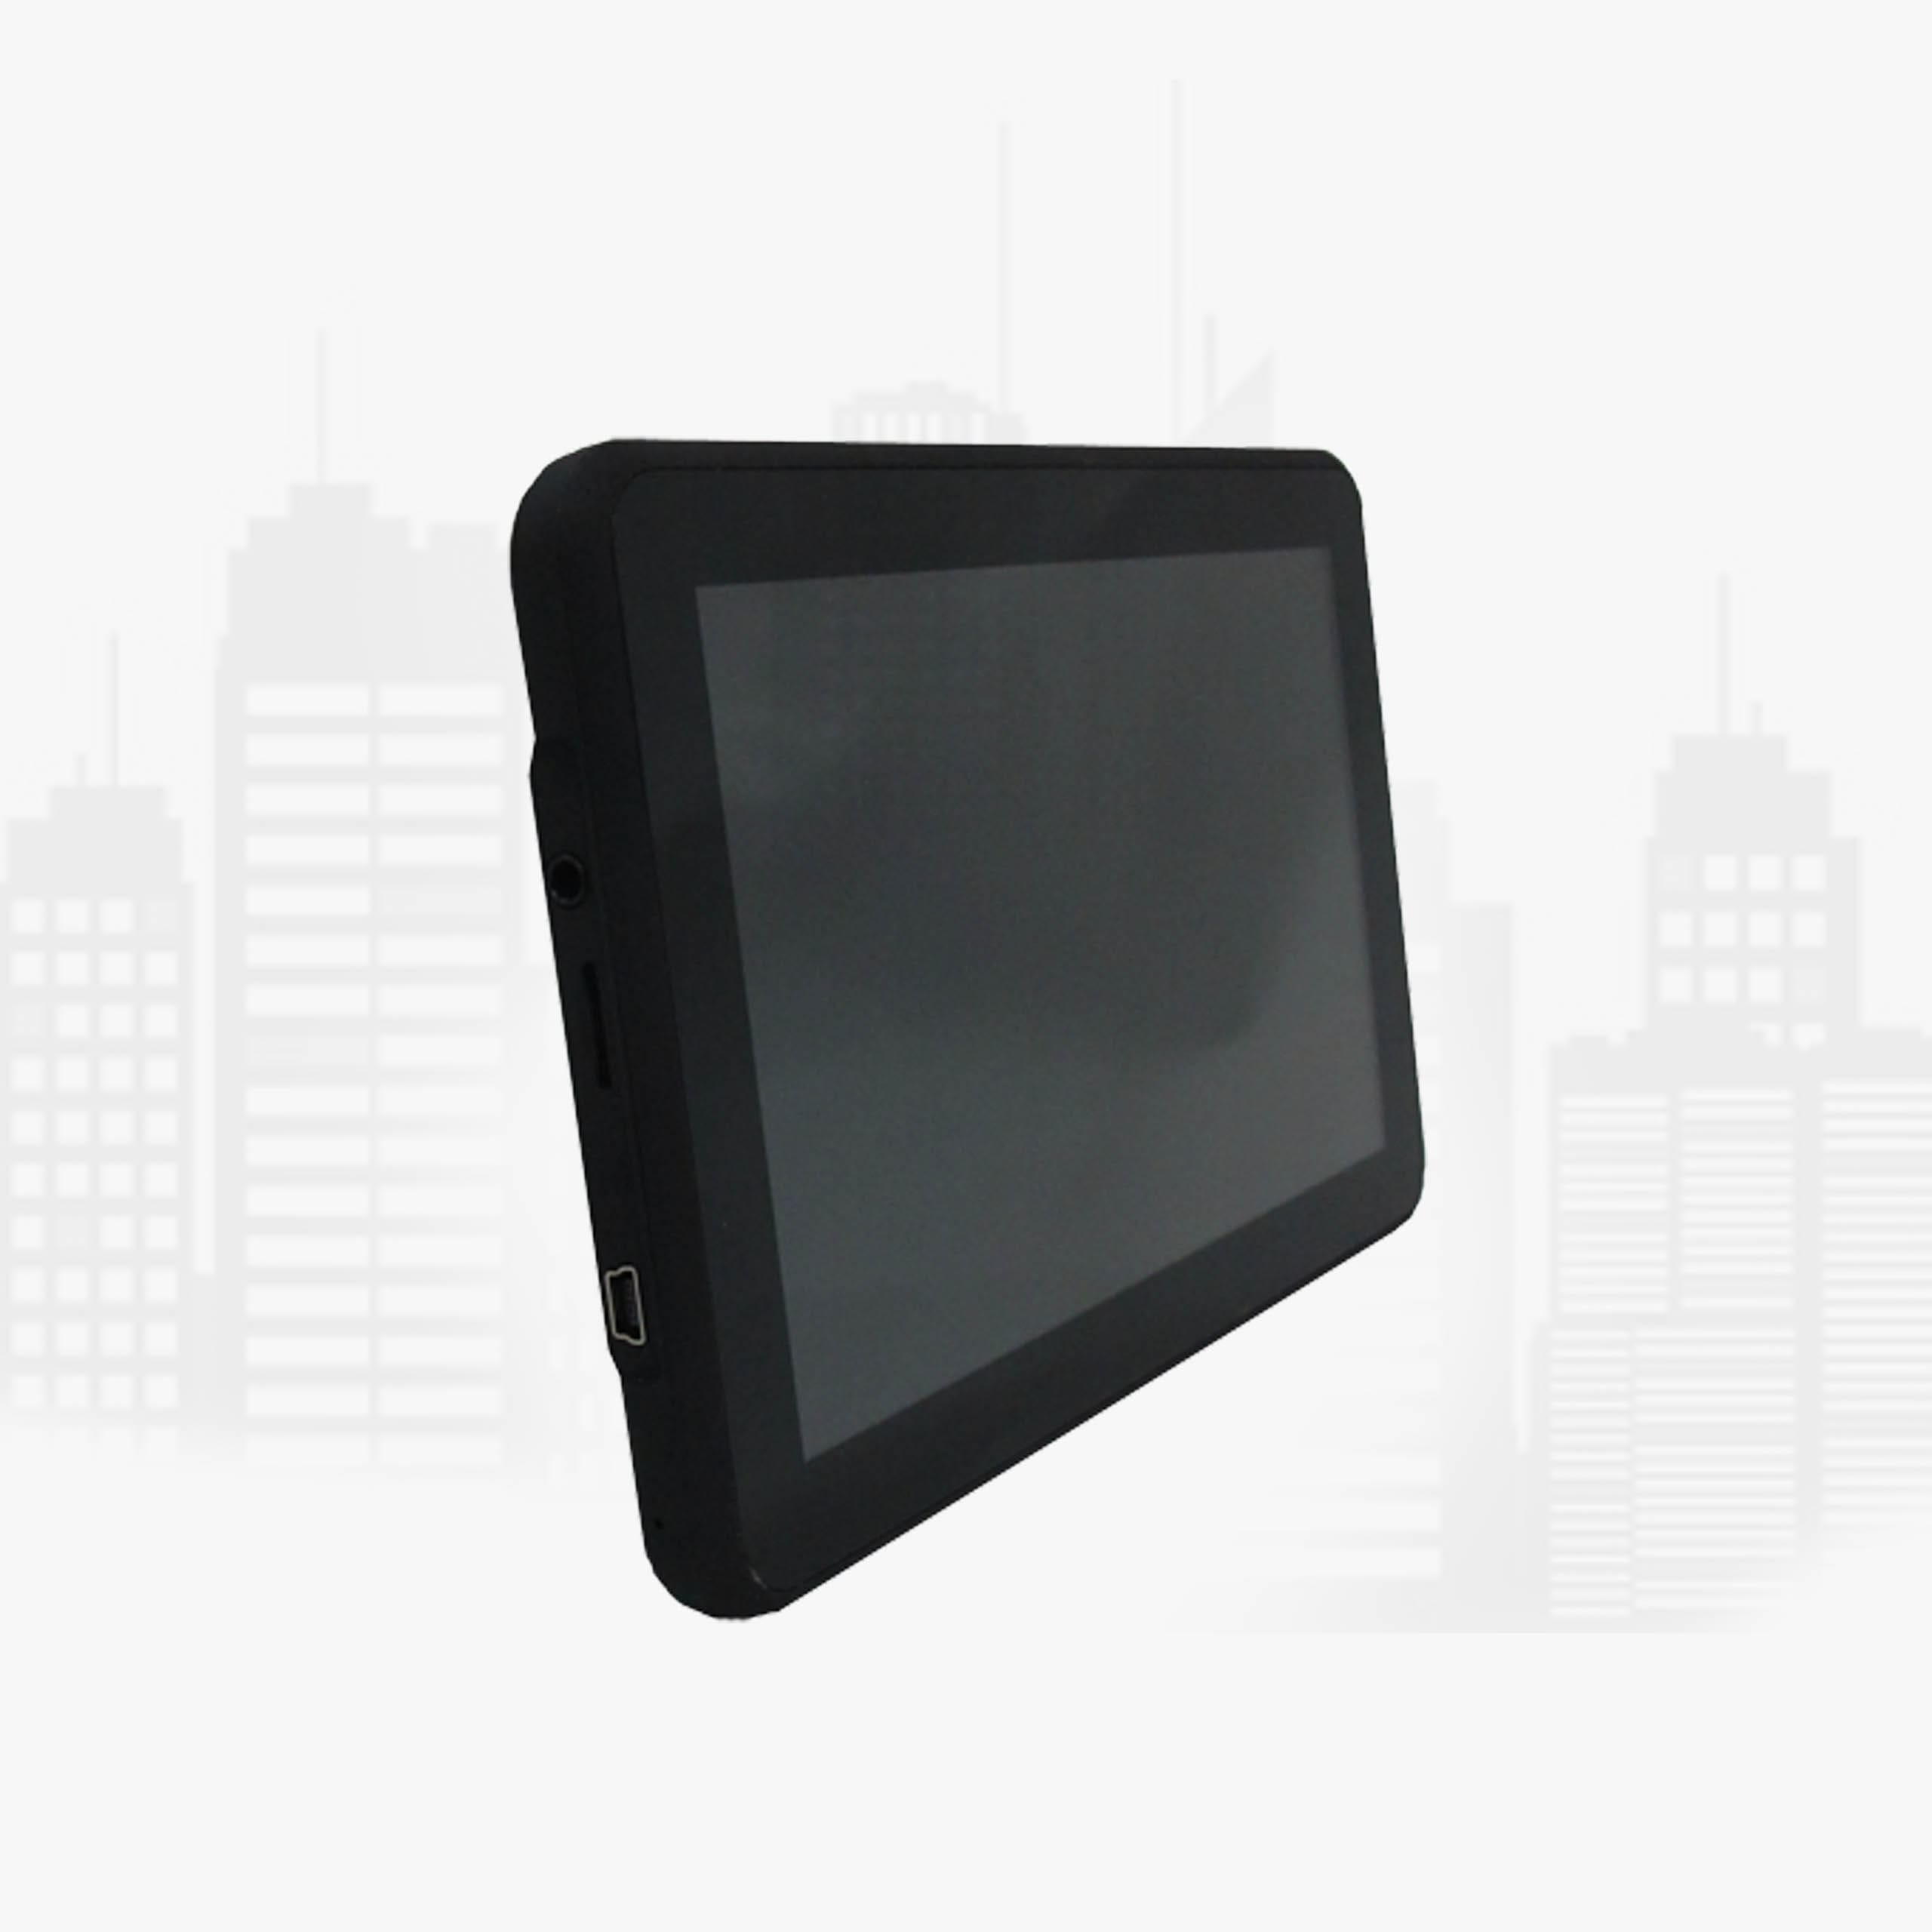 Portable Navigation Device Bw728 Tracking World